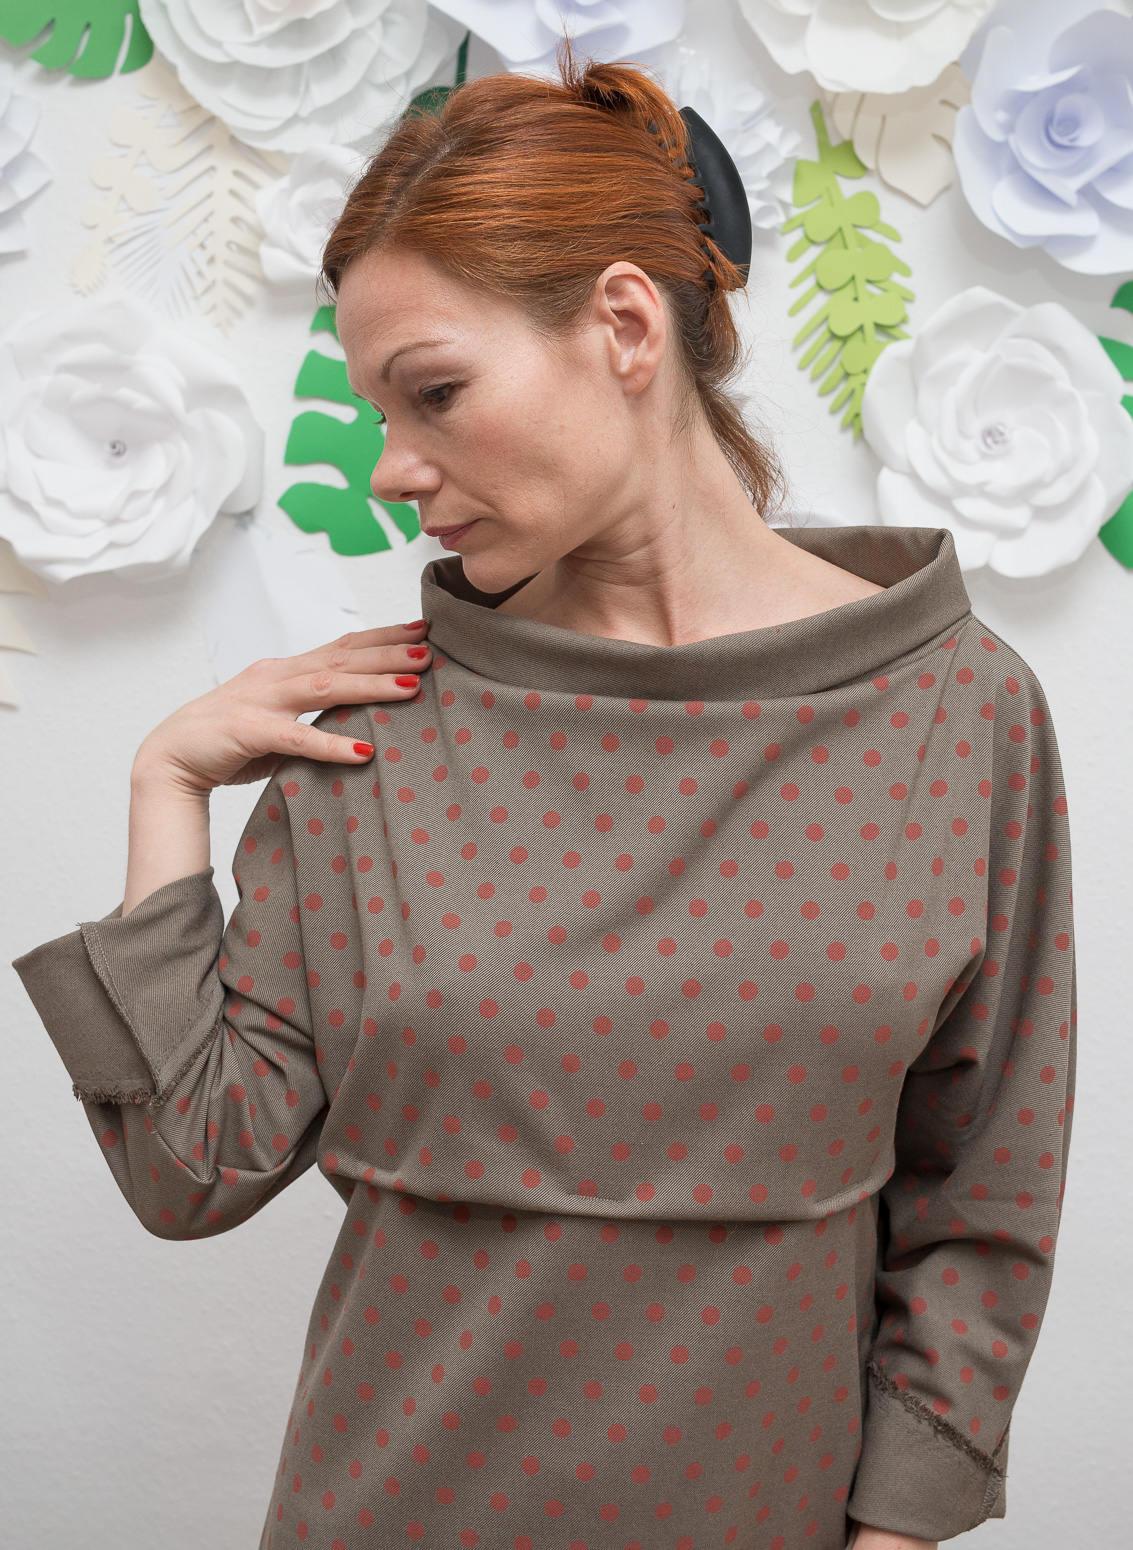 ROTETULPE Winterkleid Kimono Kleid 3